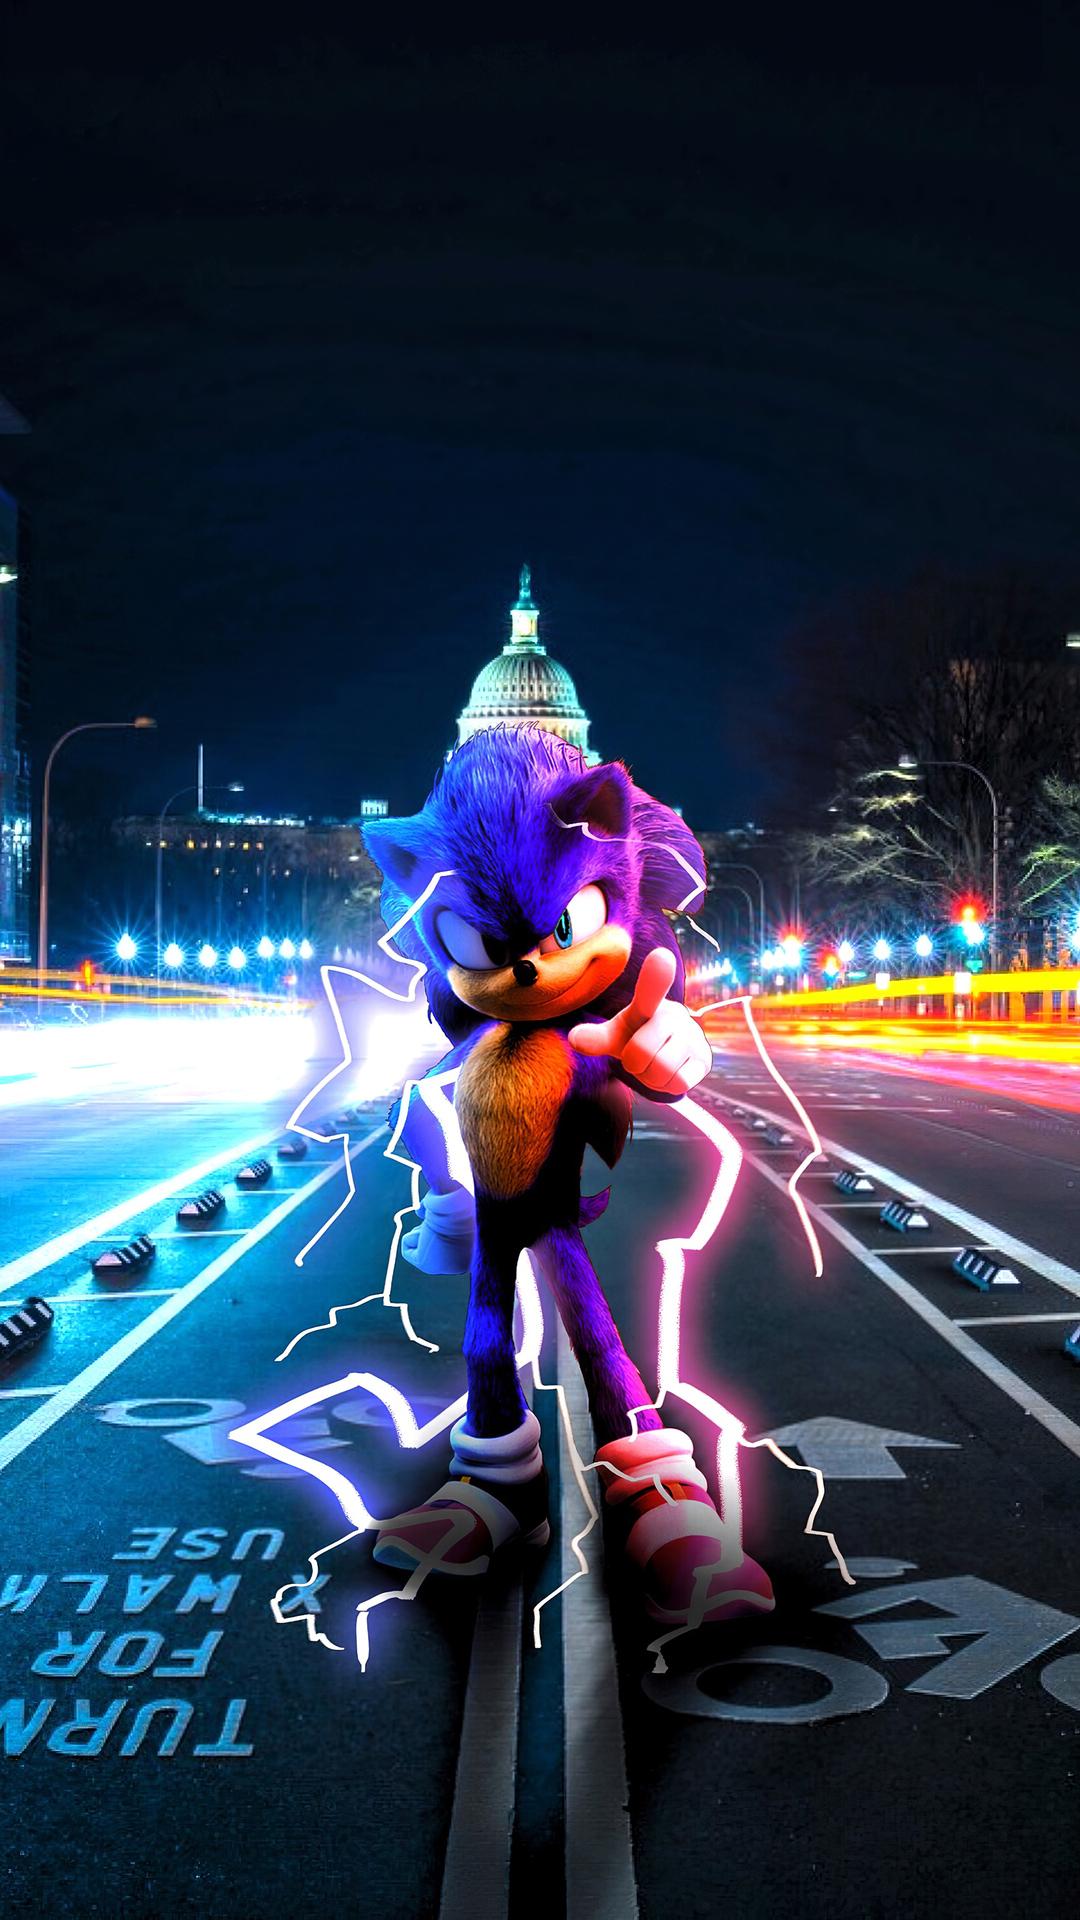 2020-sonic-the-hedgehog4k-s3.jpg